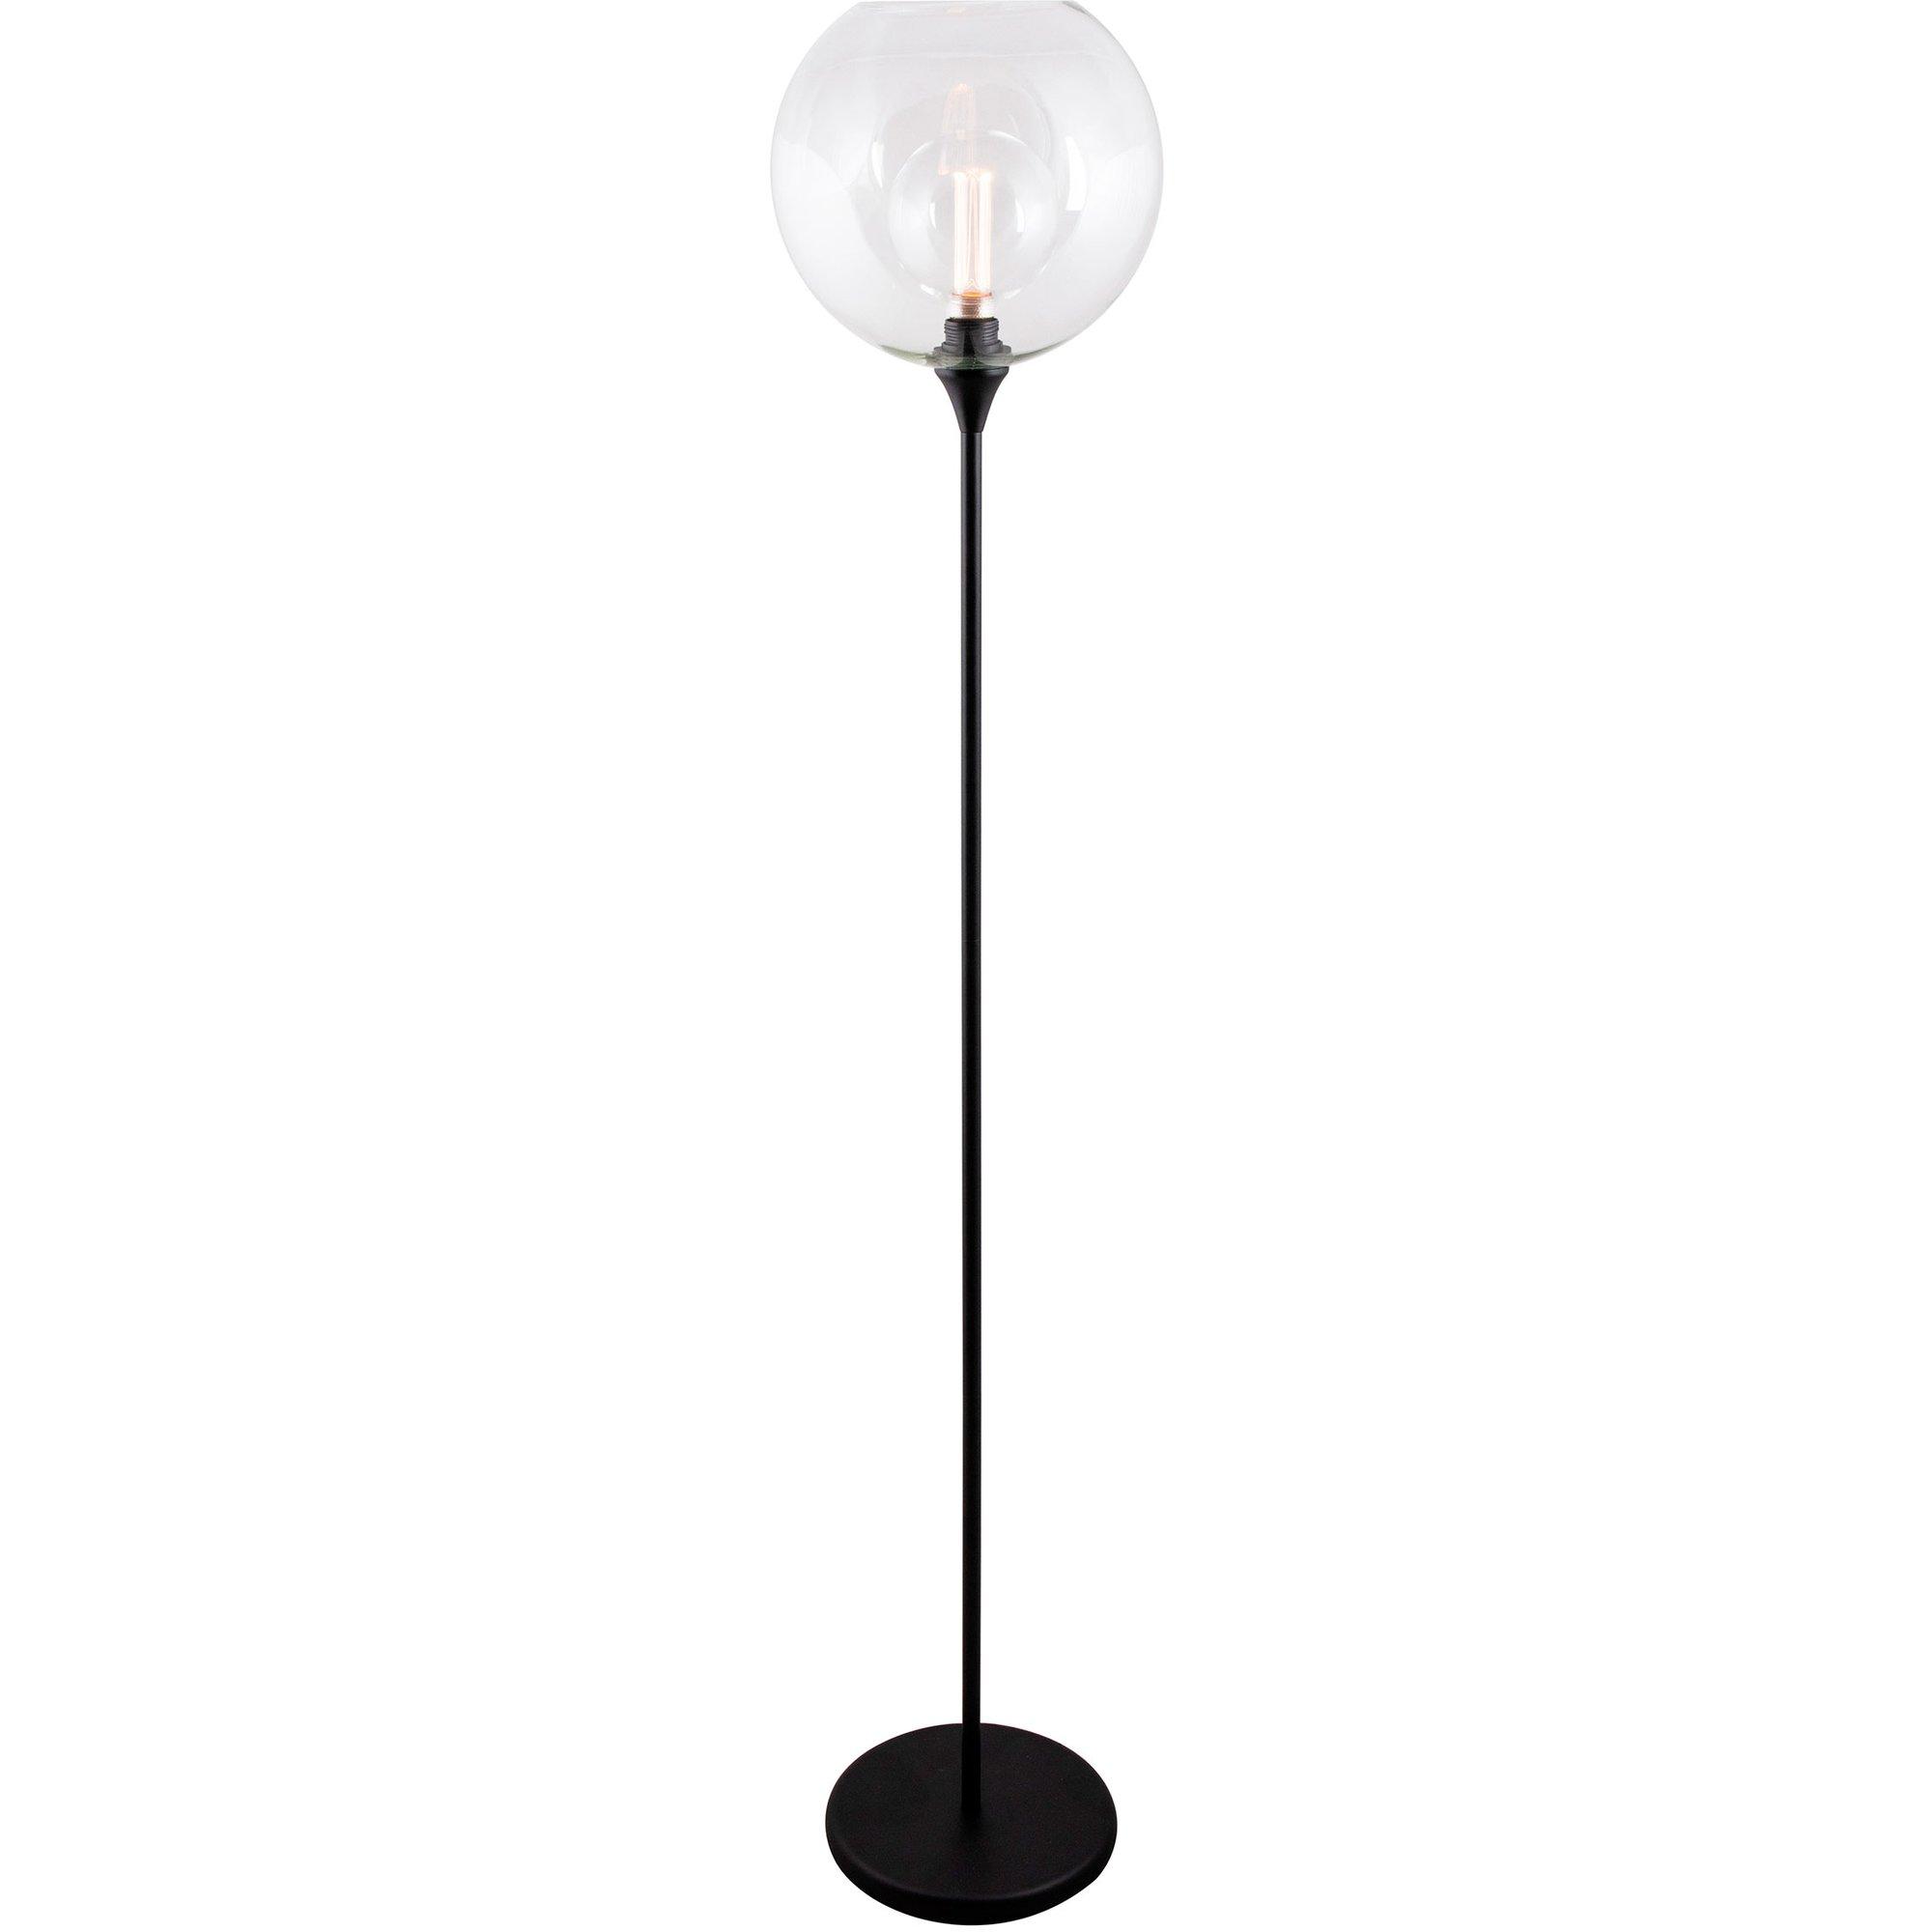 Globen Lighting Bowl Golvlampa klar